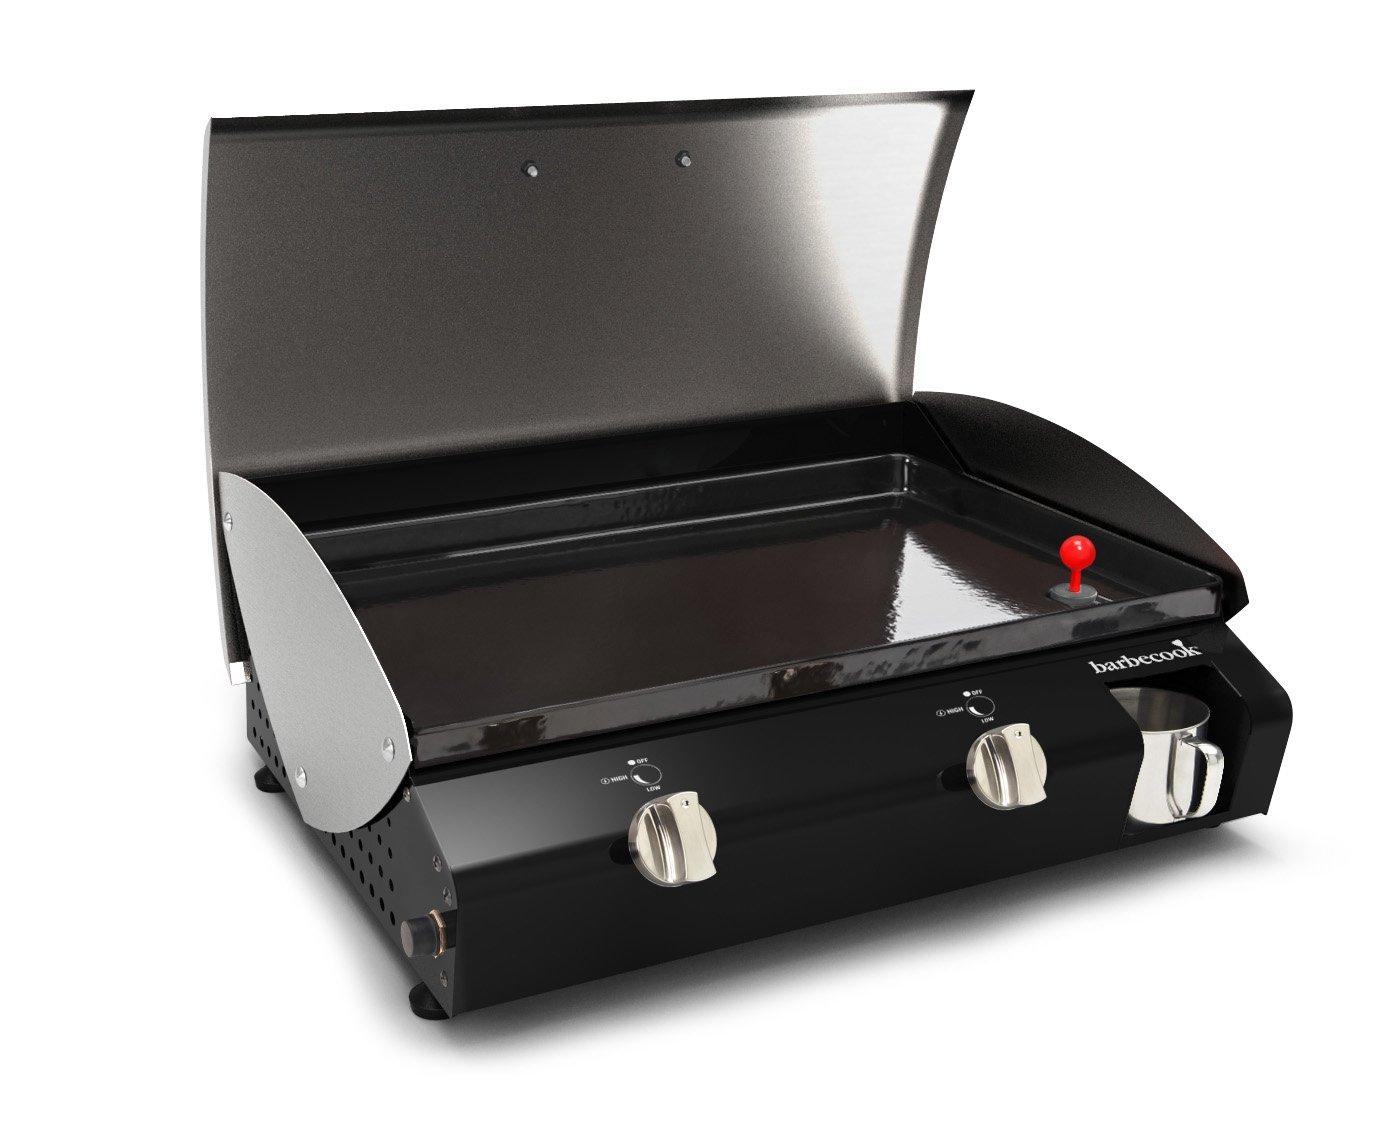 Barbecook SST Bero Plancha günstig kaufen